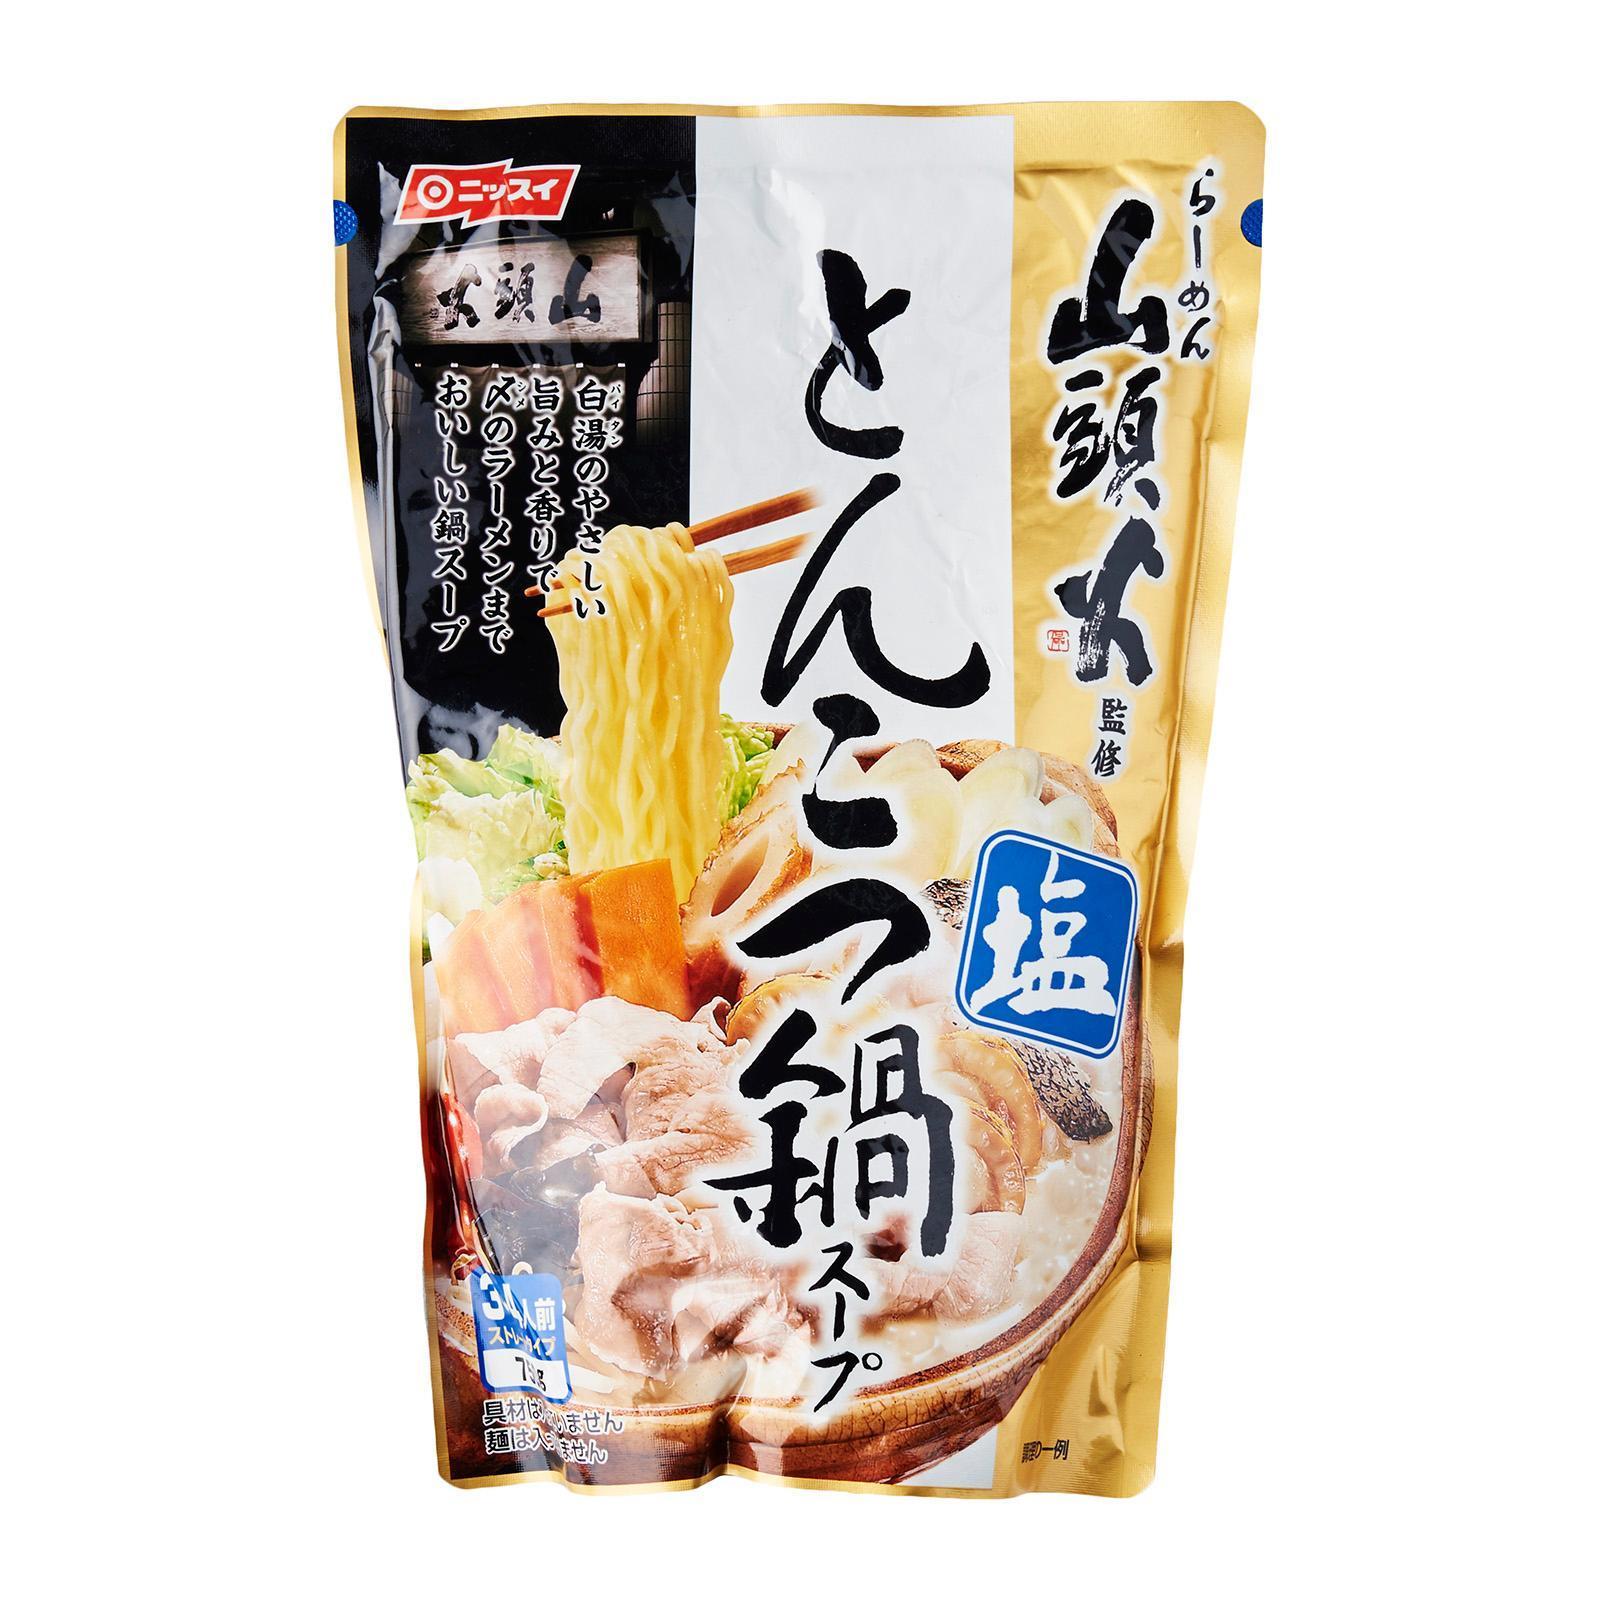 Nissui Santouka Porkbone Broth Tonkotsu Hot Pot Soup